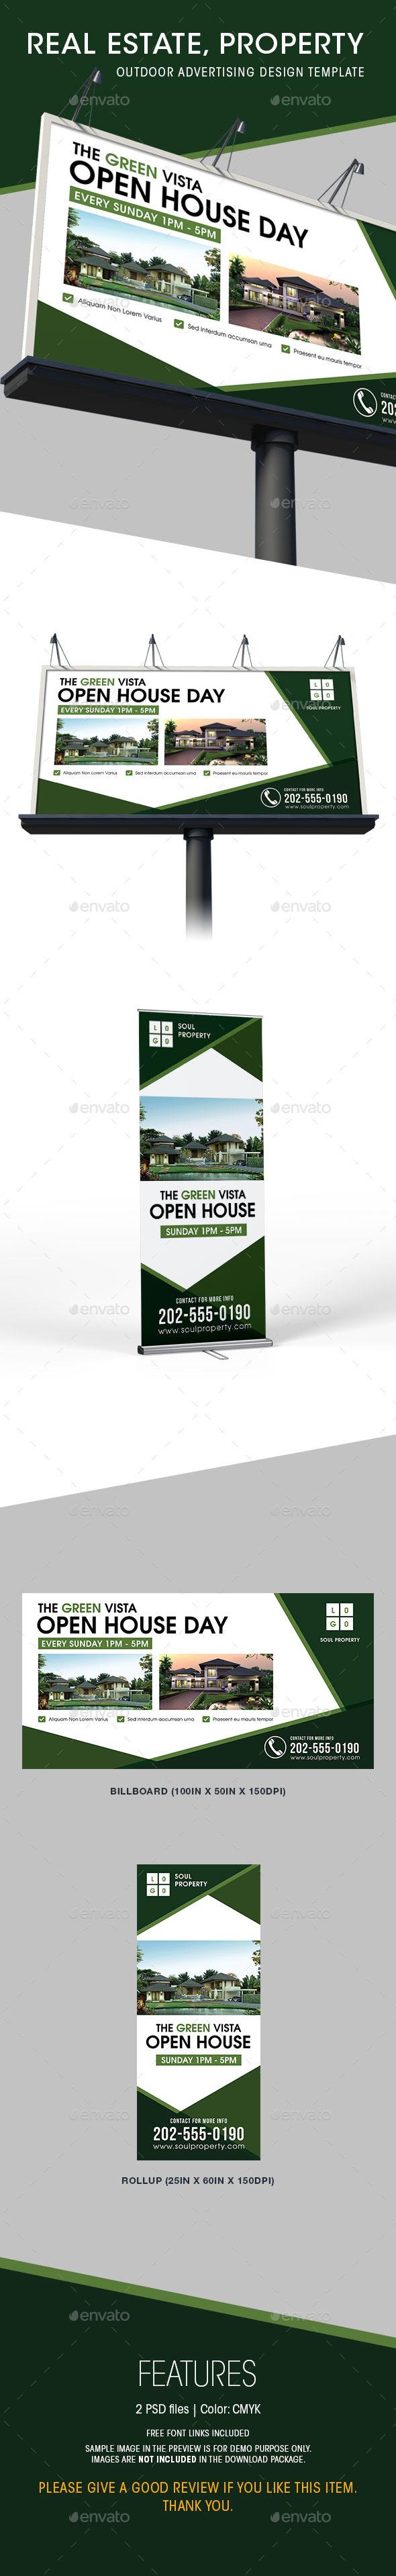 Real estate billboard design samples - Real Estate Billboard Rollup Templates Signage Print Templates